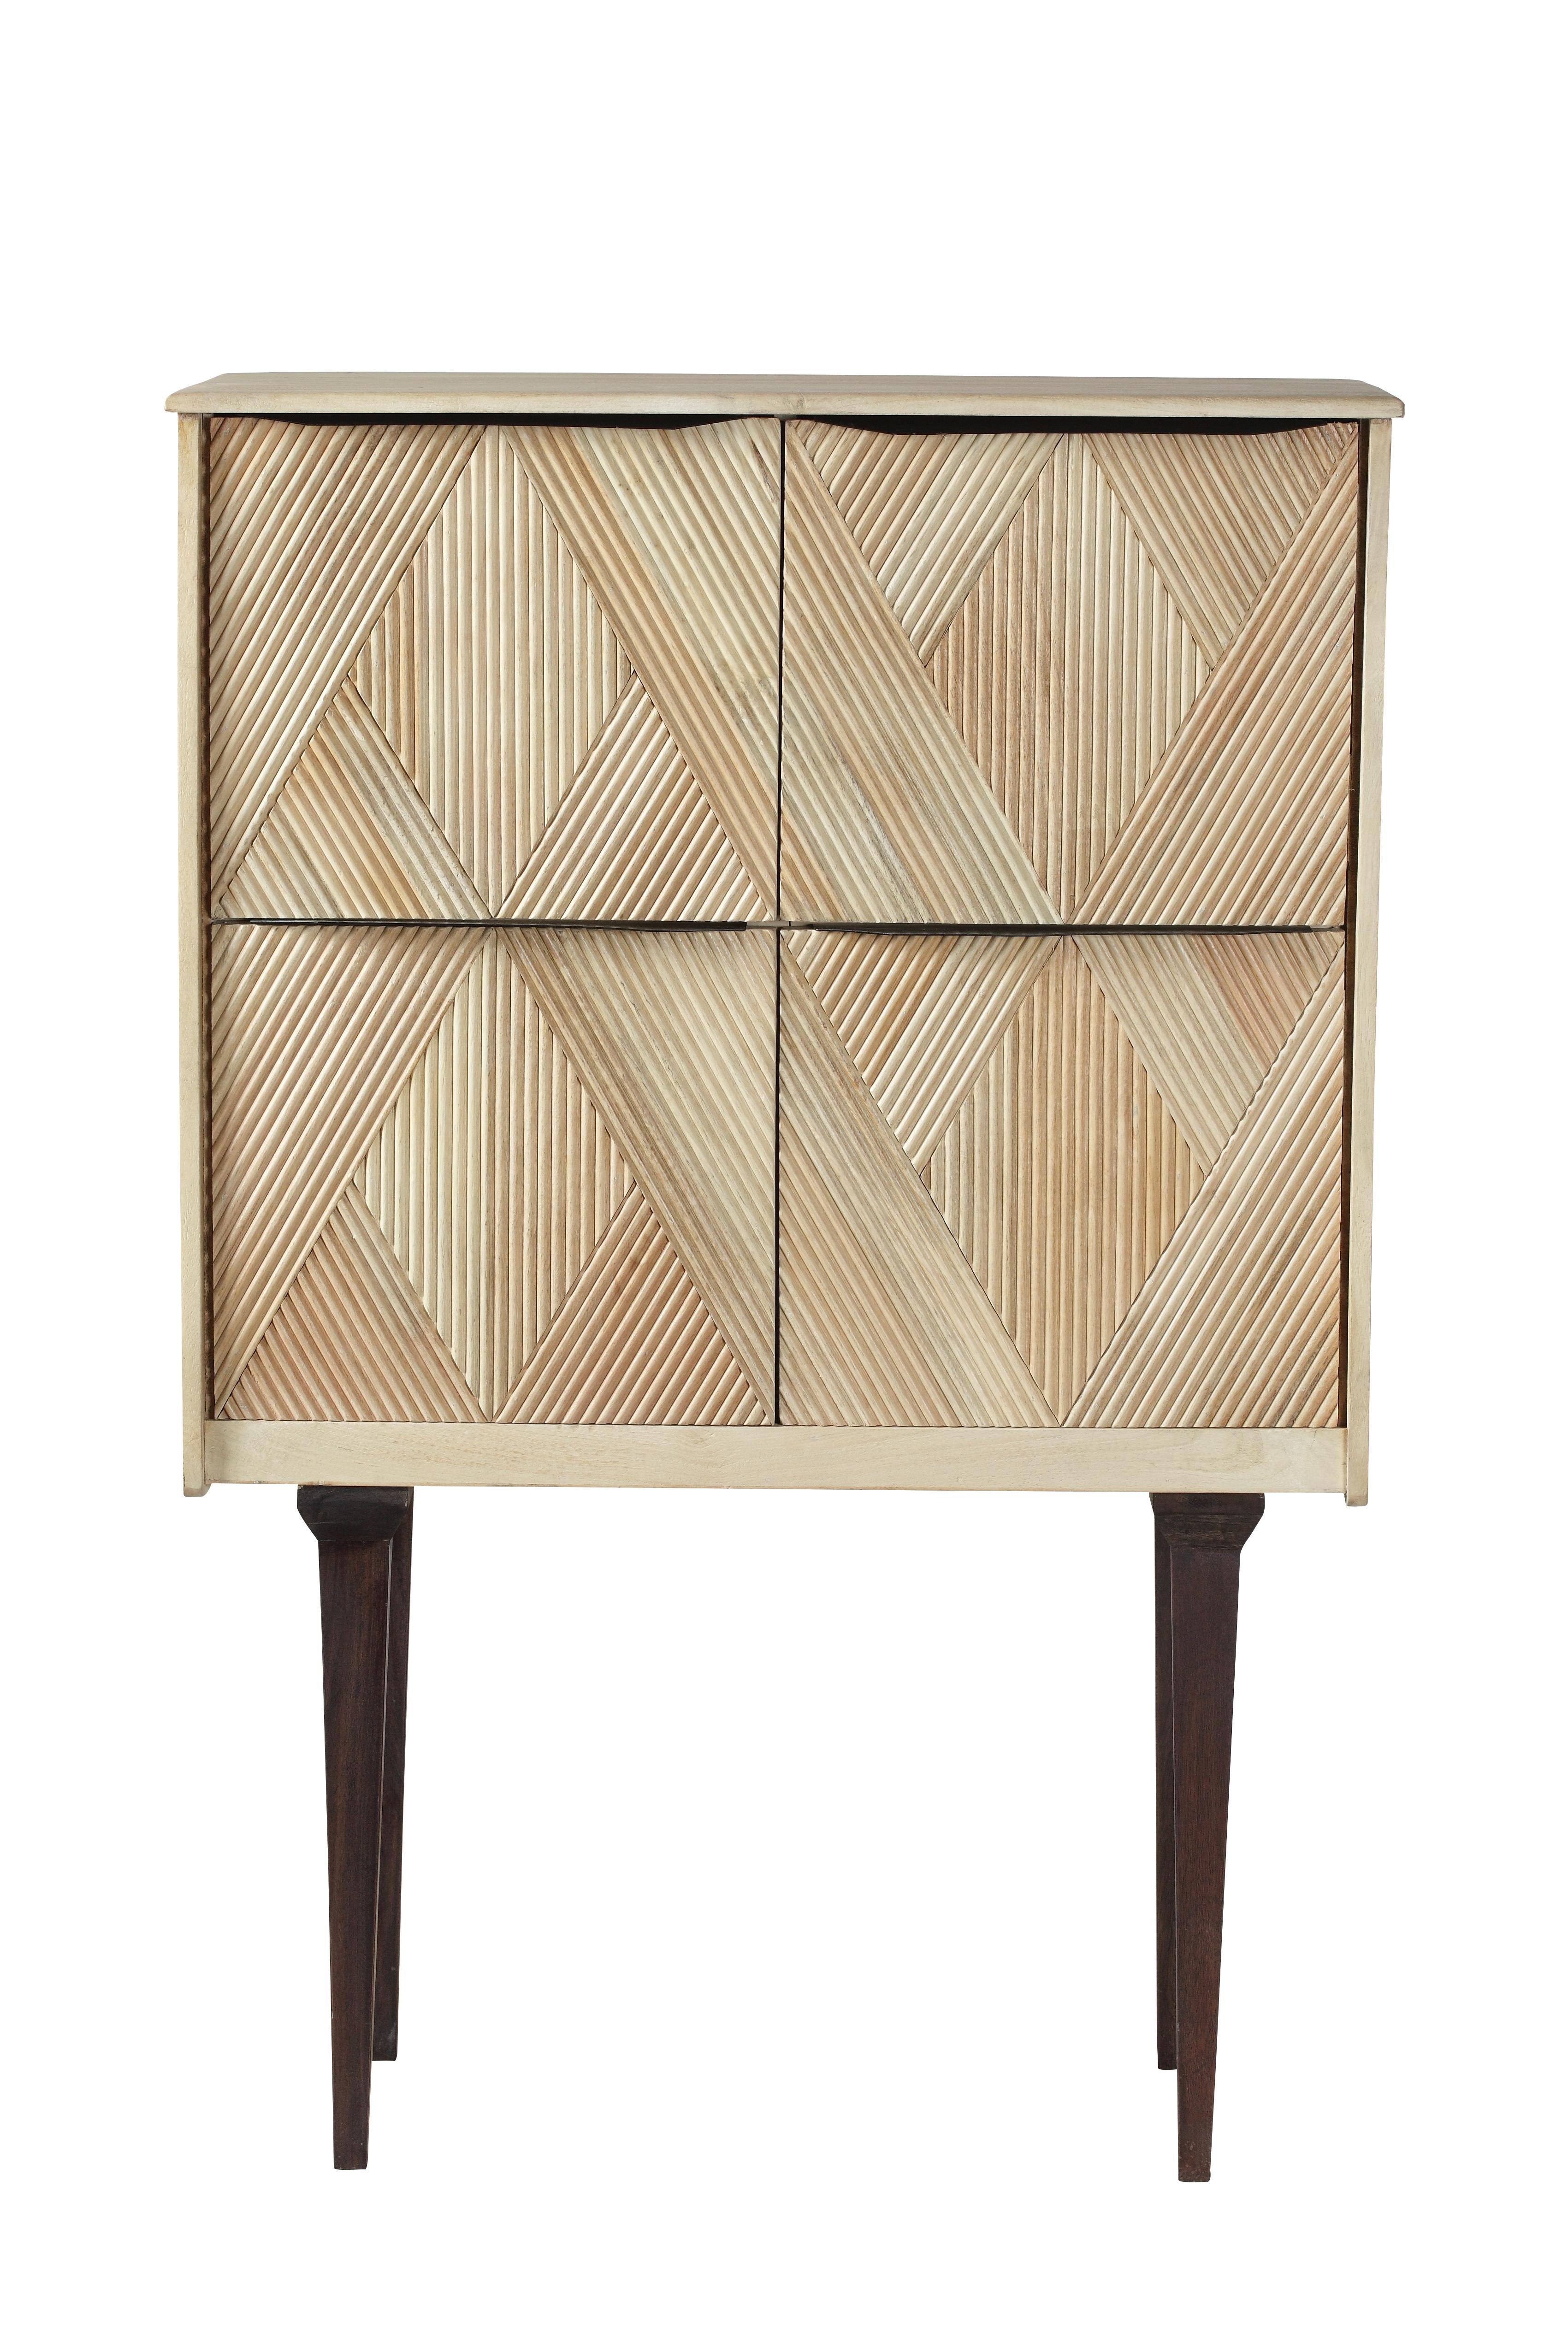 poze cu Cabinet Gatsby Raw, L85xl40,5xh127 cm